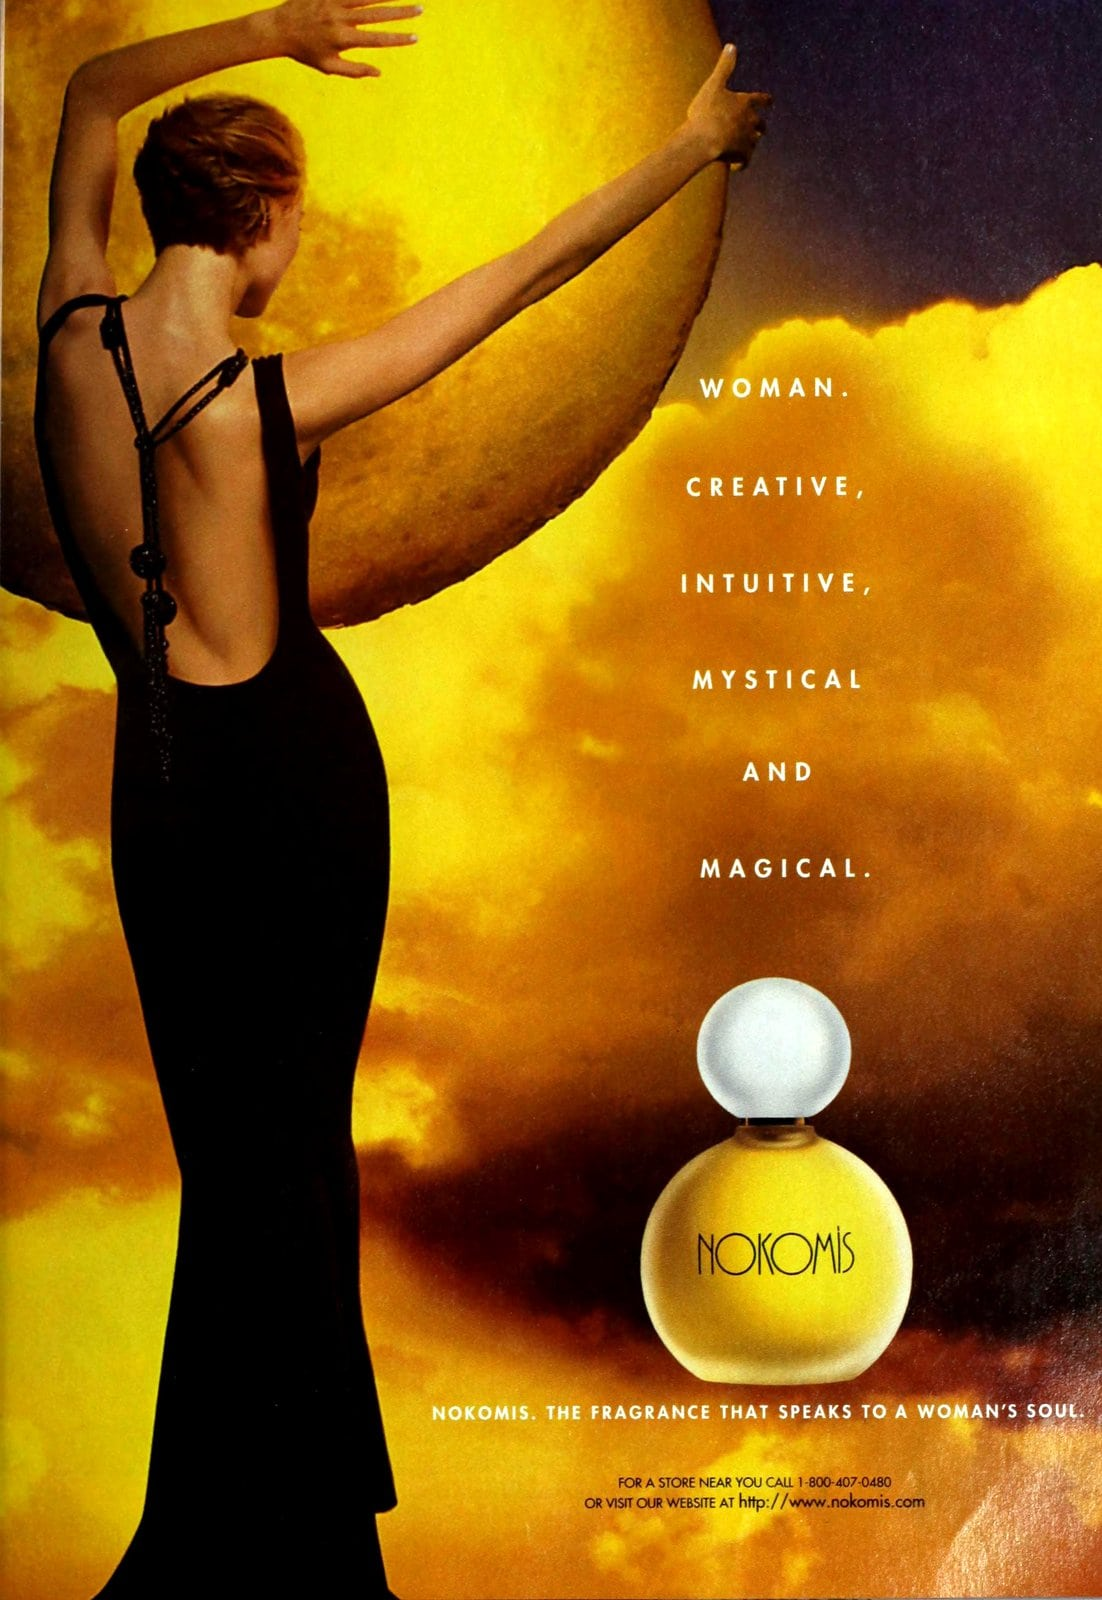 Nokomis fragrance (1995) at ClickAmericana com